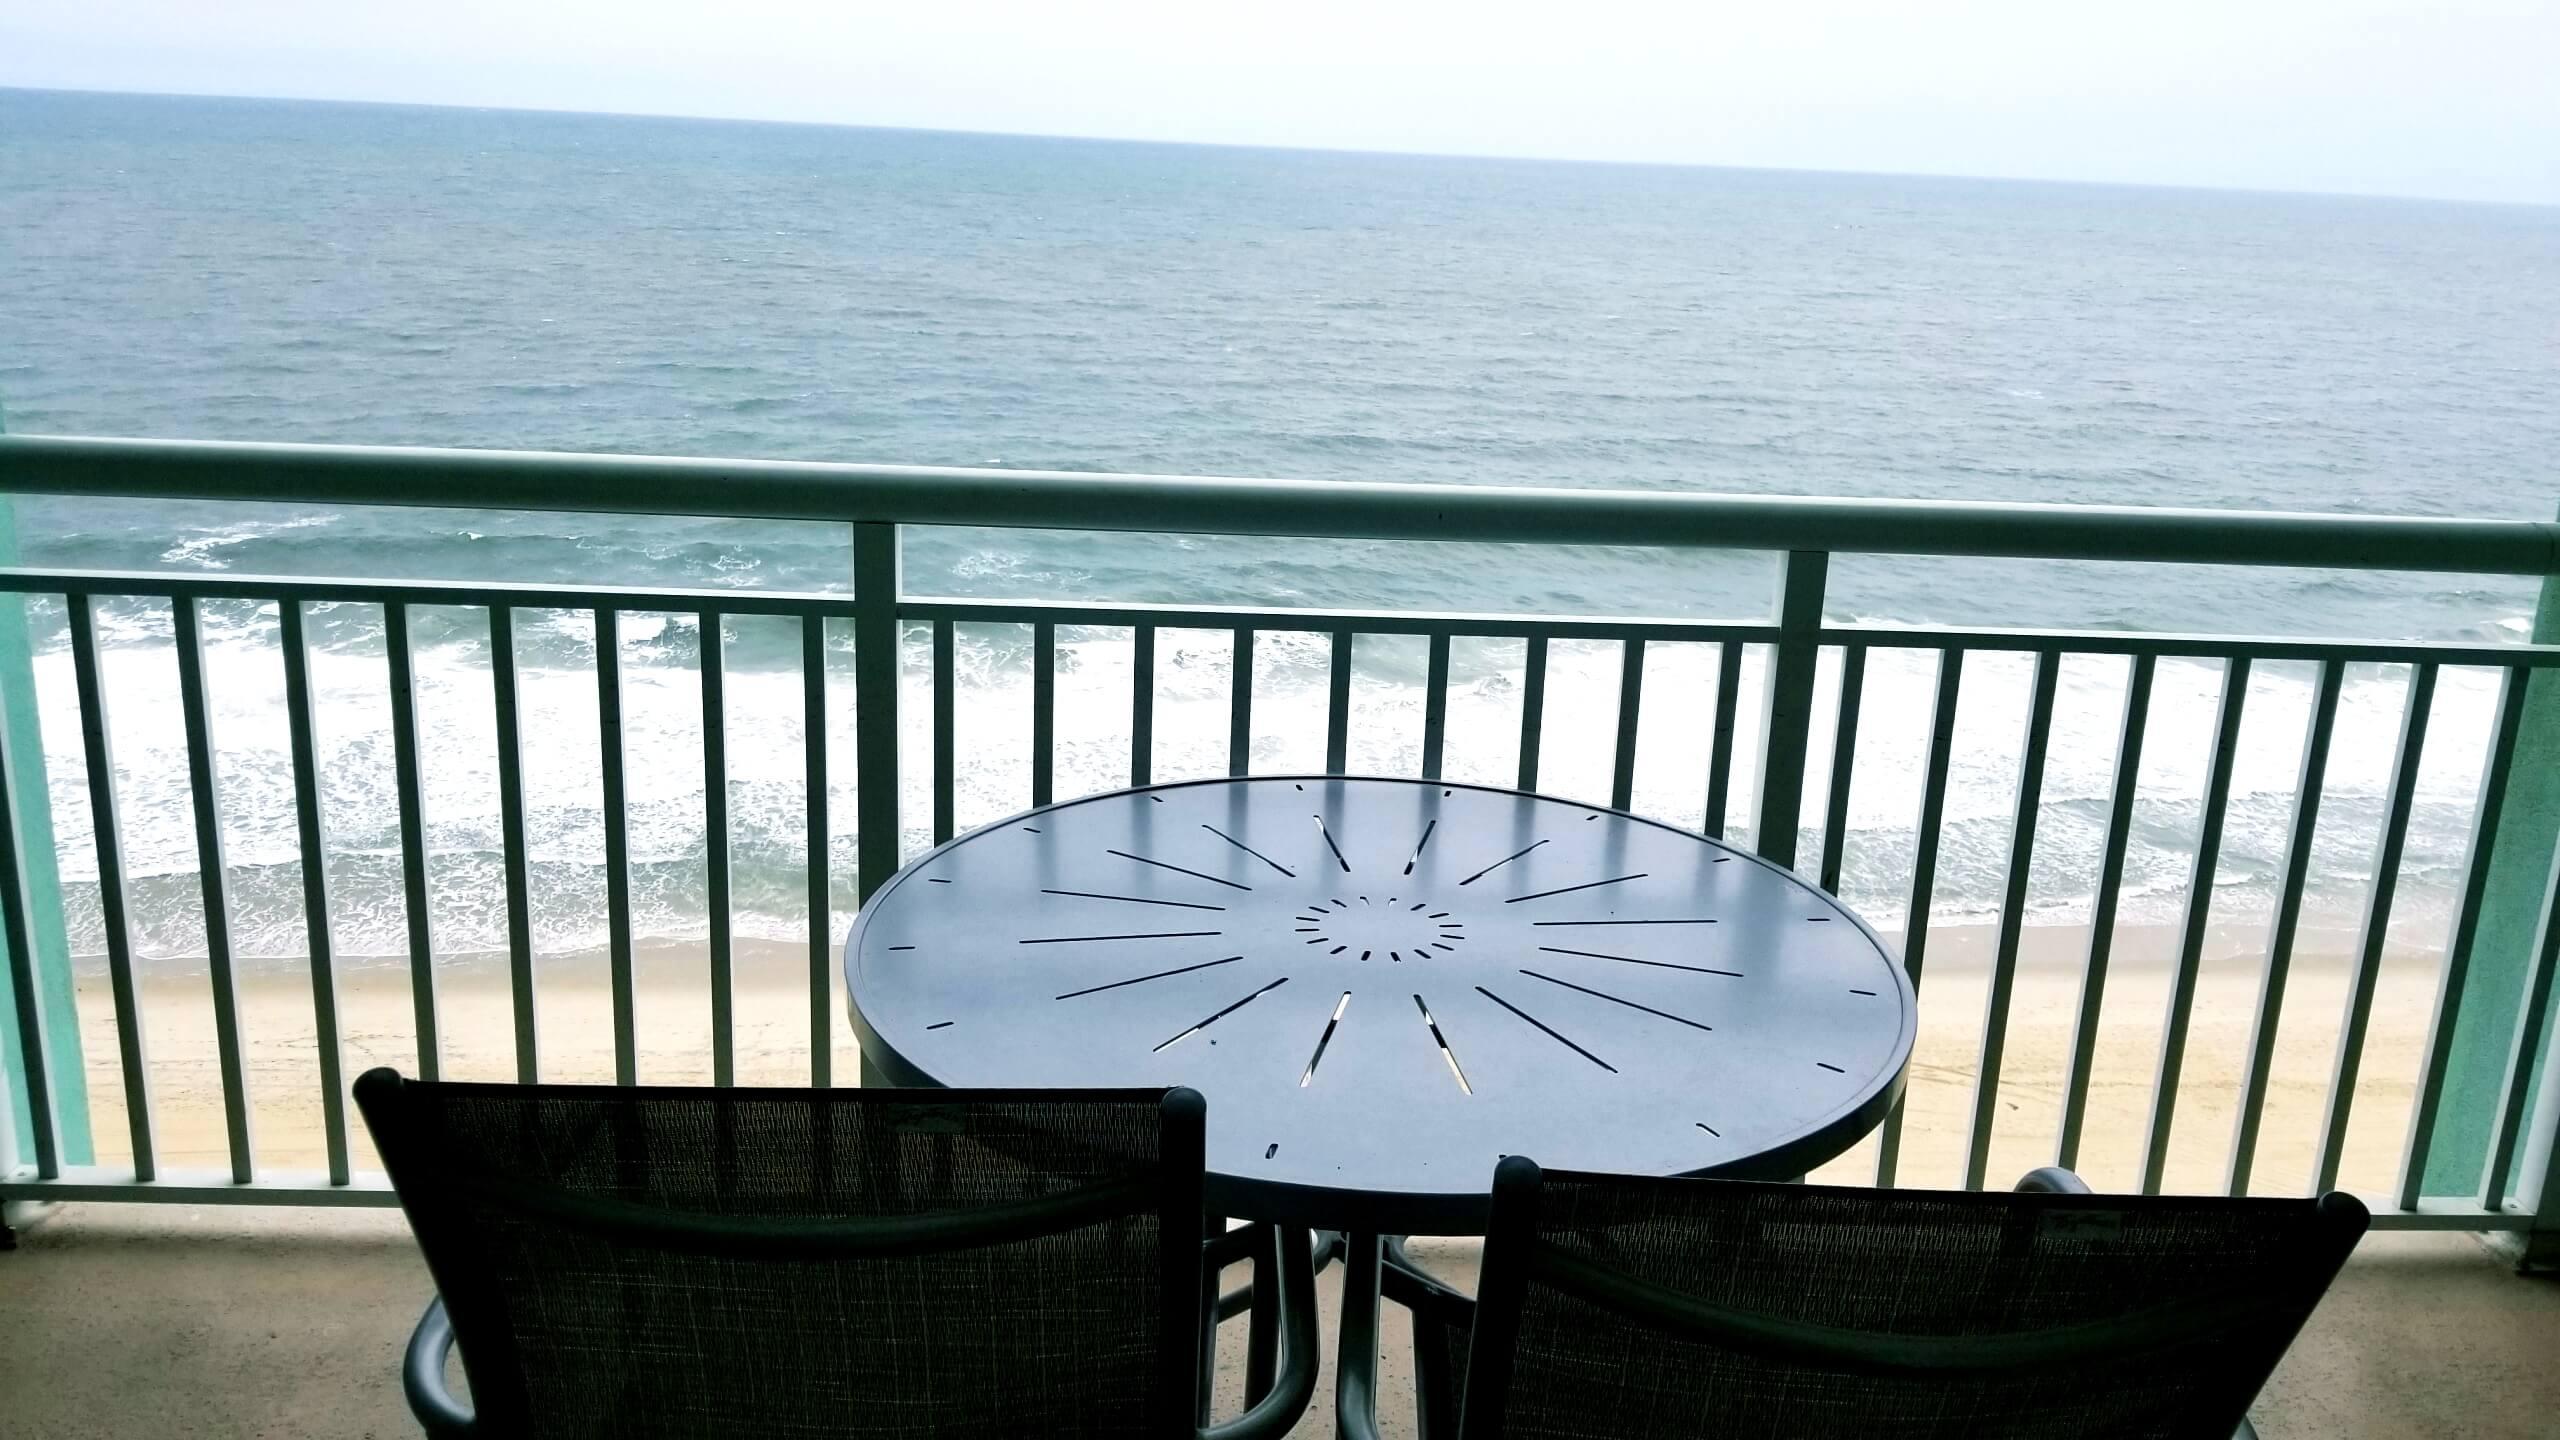 Hilton Suite Ocean City Balcony with Ocean View